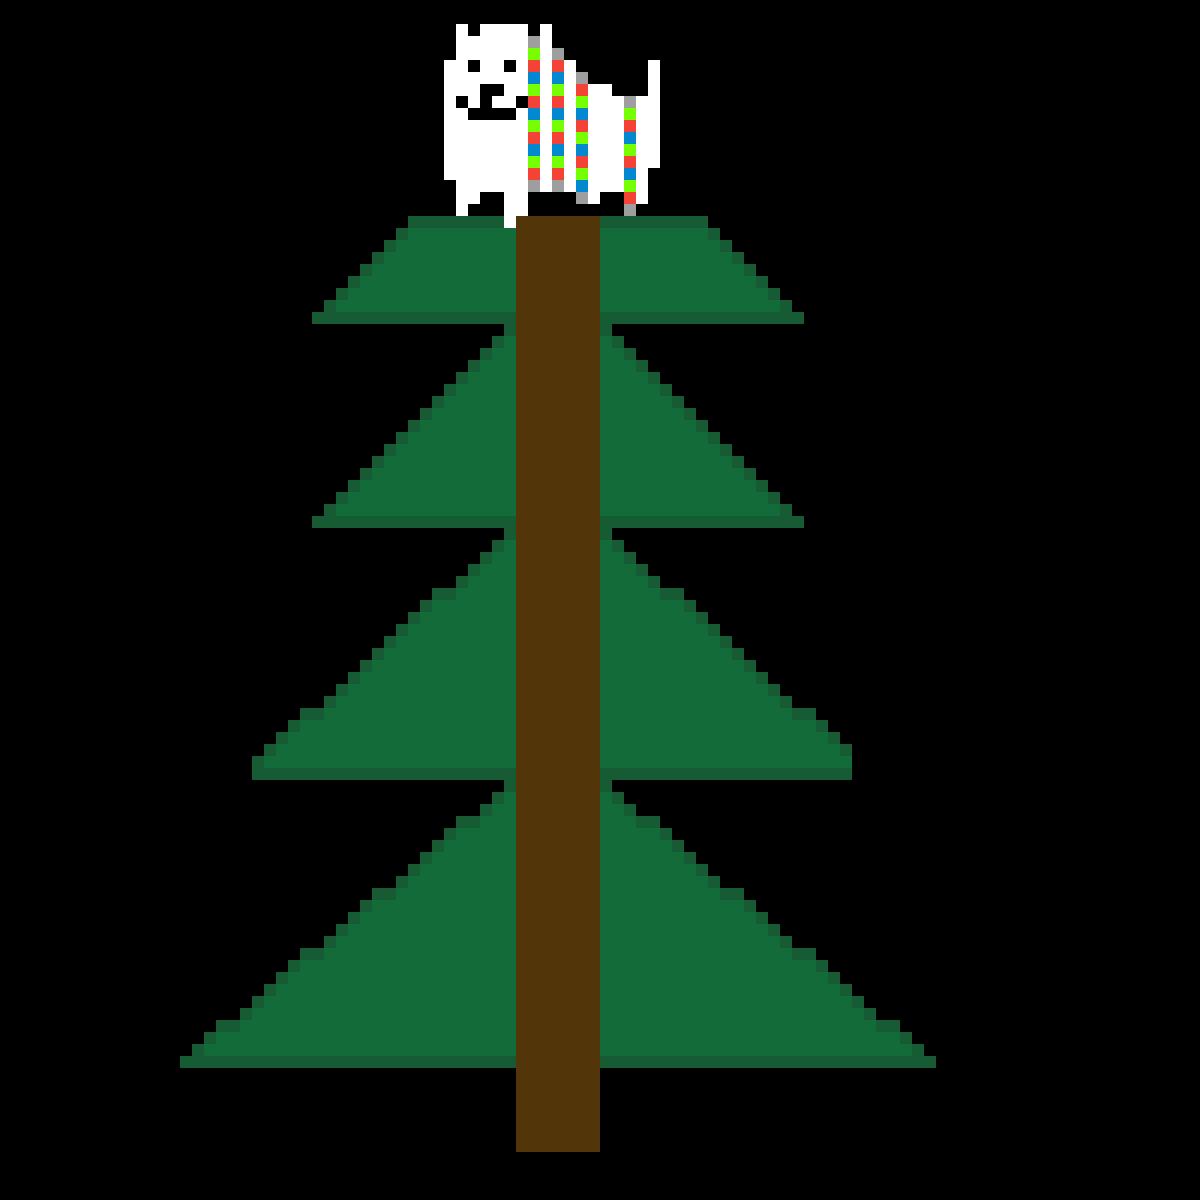 Christmas Discord.Pixilart Discord Server Christmas Logo By Scw Productions